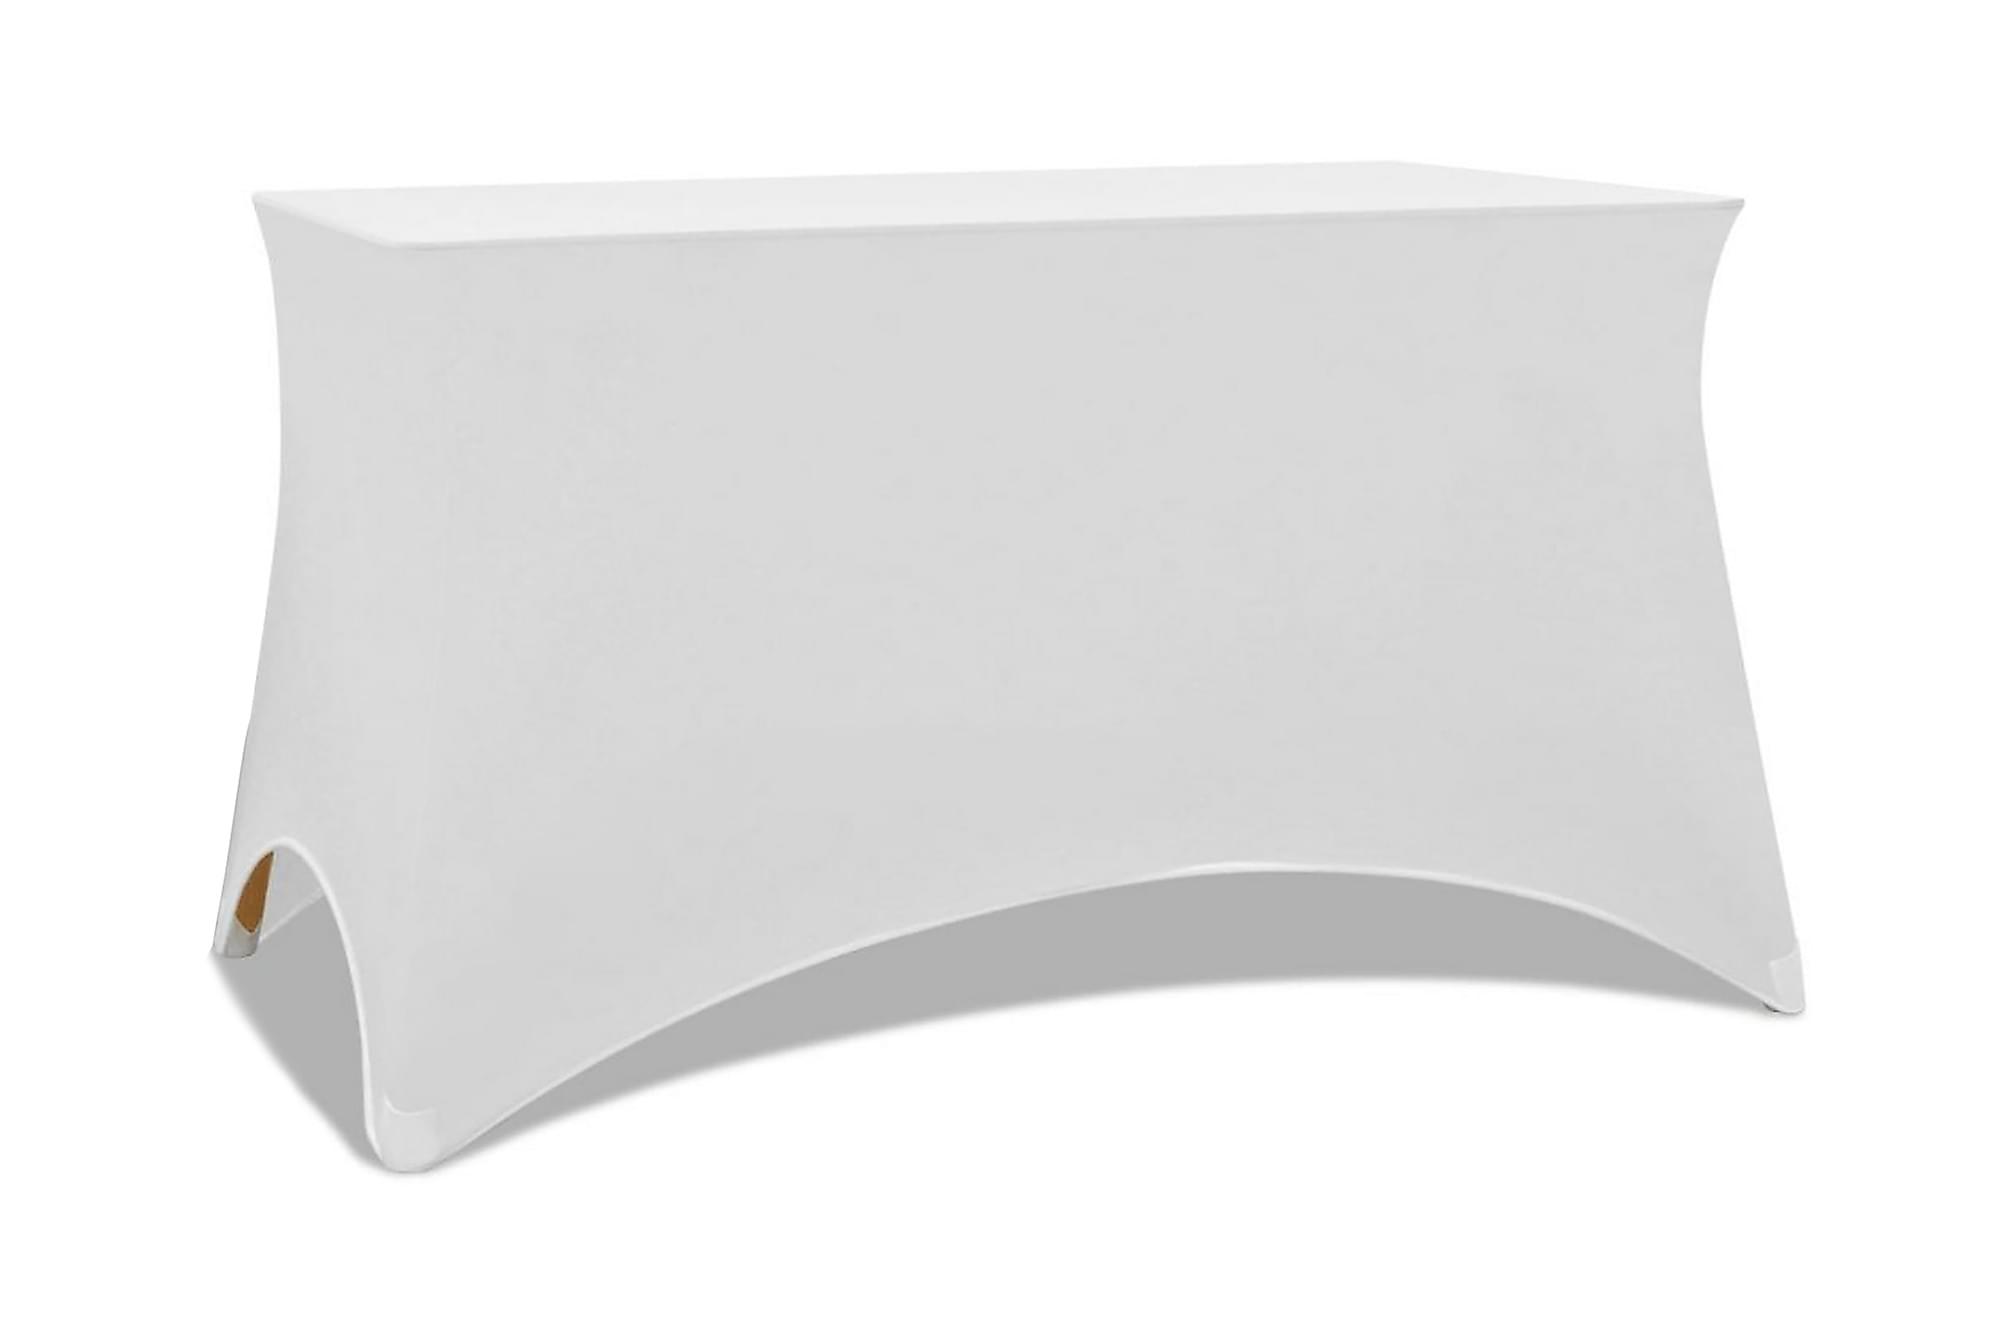 Bordsöverdrag stretch 2 st vit 120x60,5x74 cm, Möbelvård